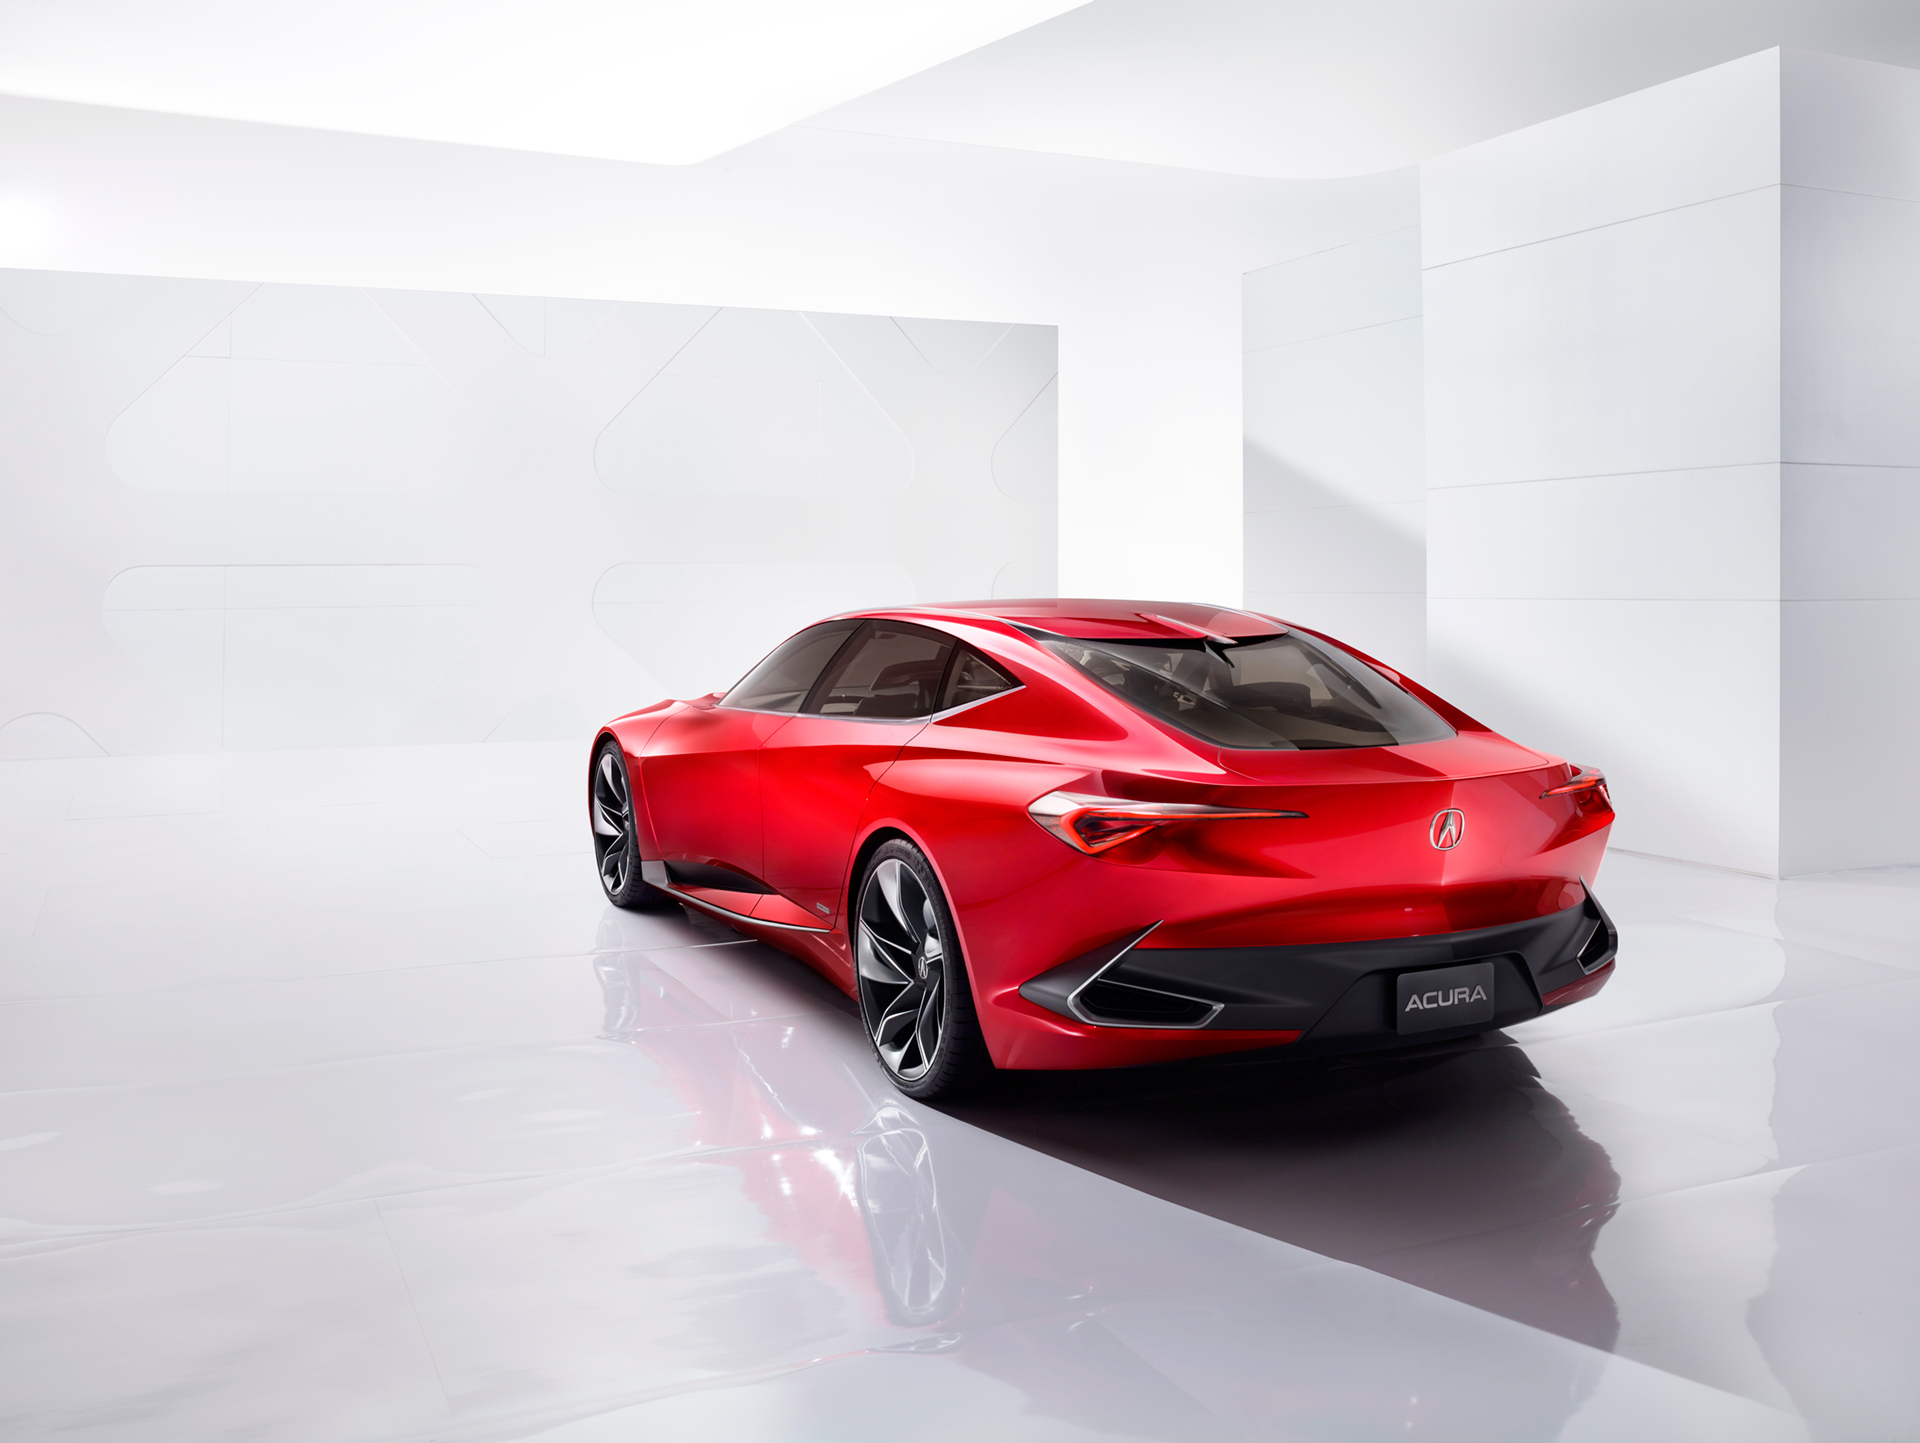 Acura Precison Concept - 2016 - rear side-face / profil arrière